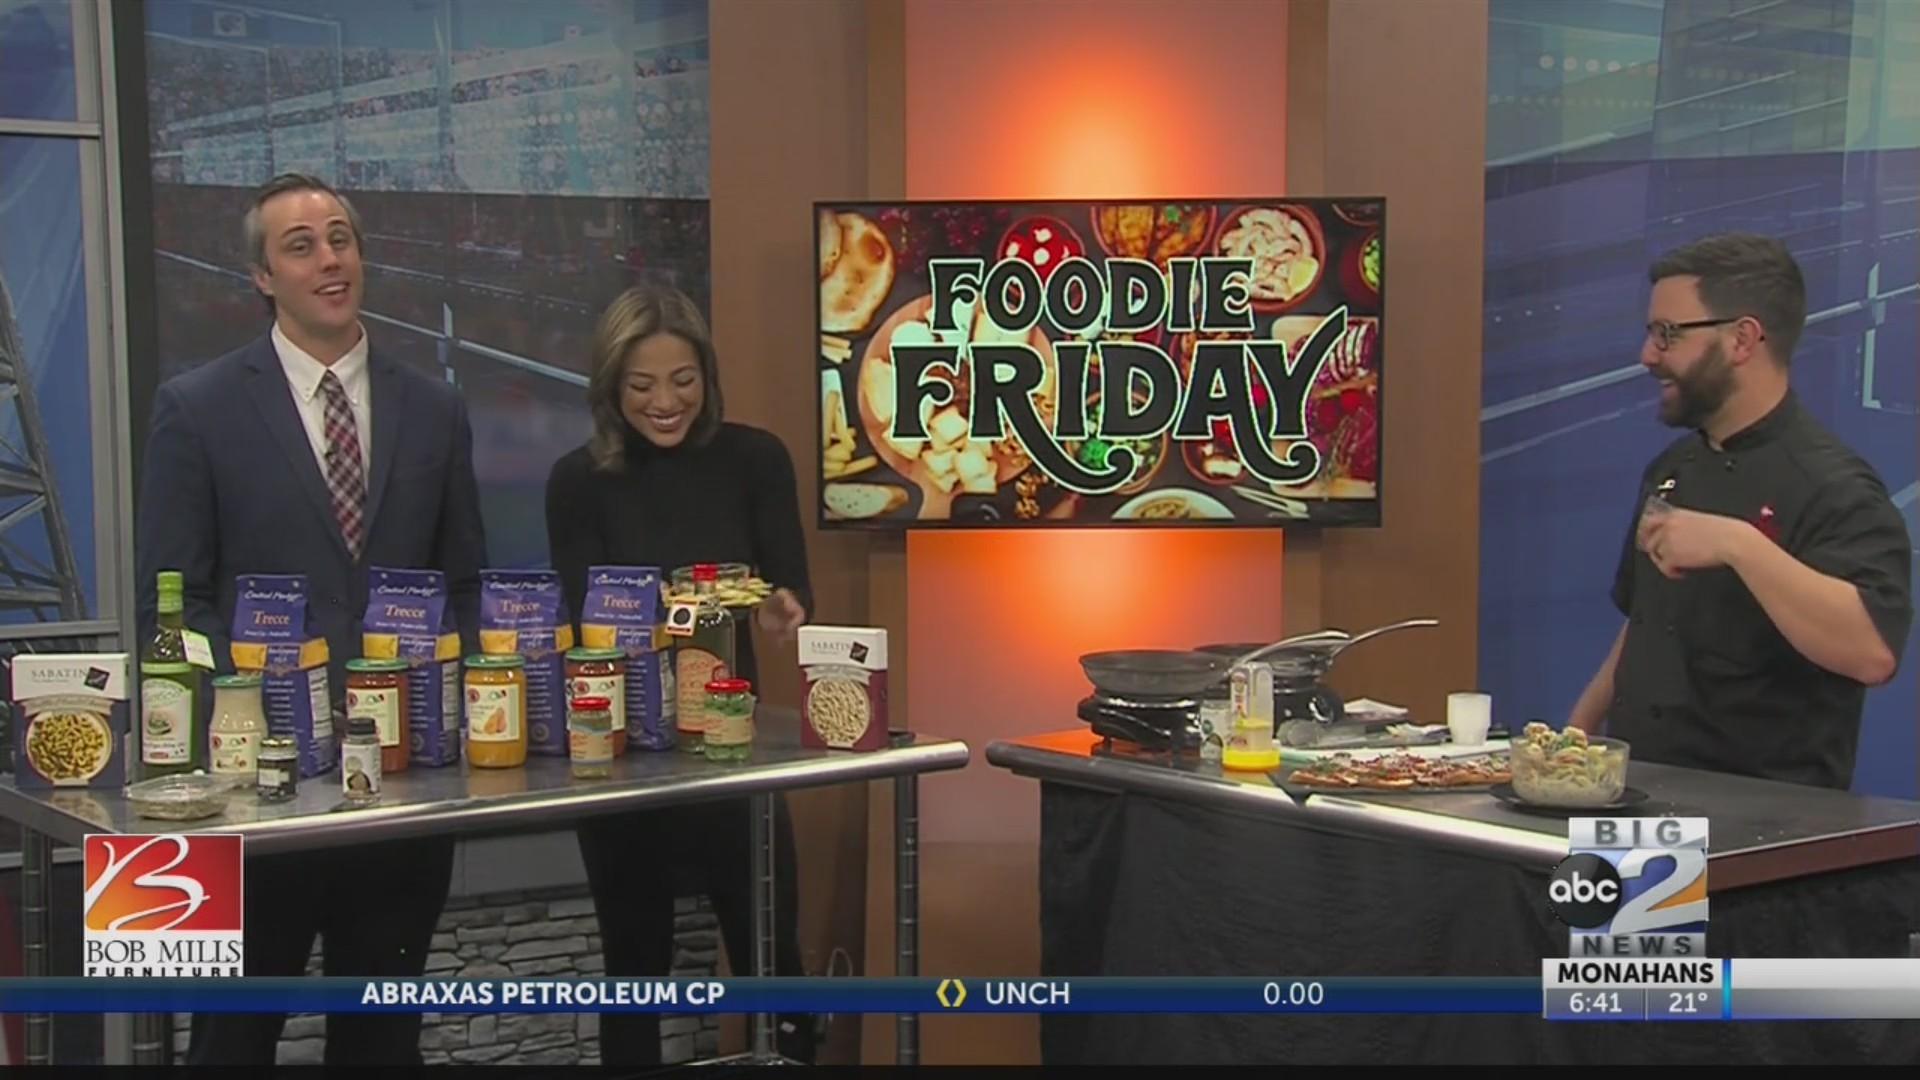 Foodie Friday - 1/25/19 Part 1